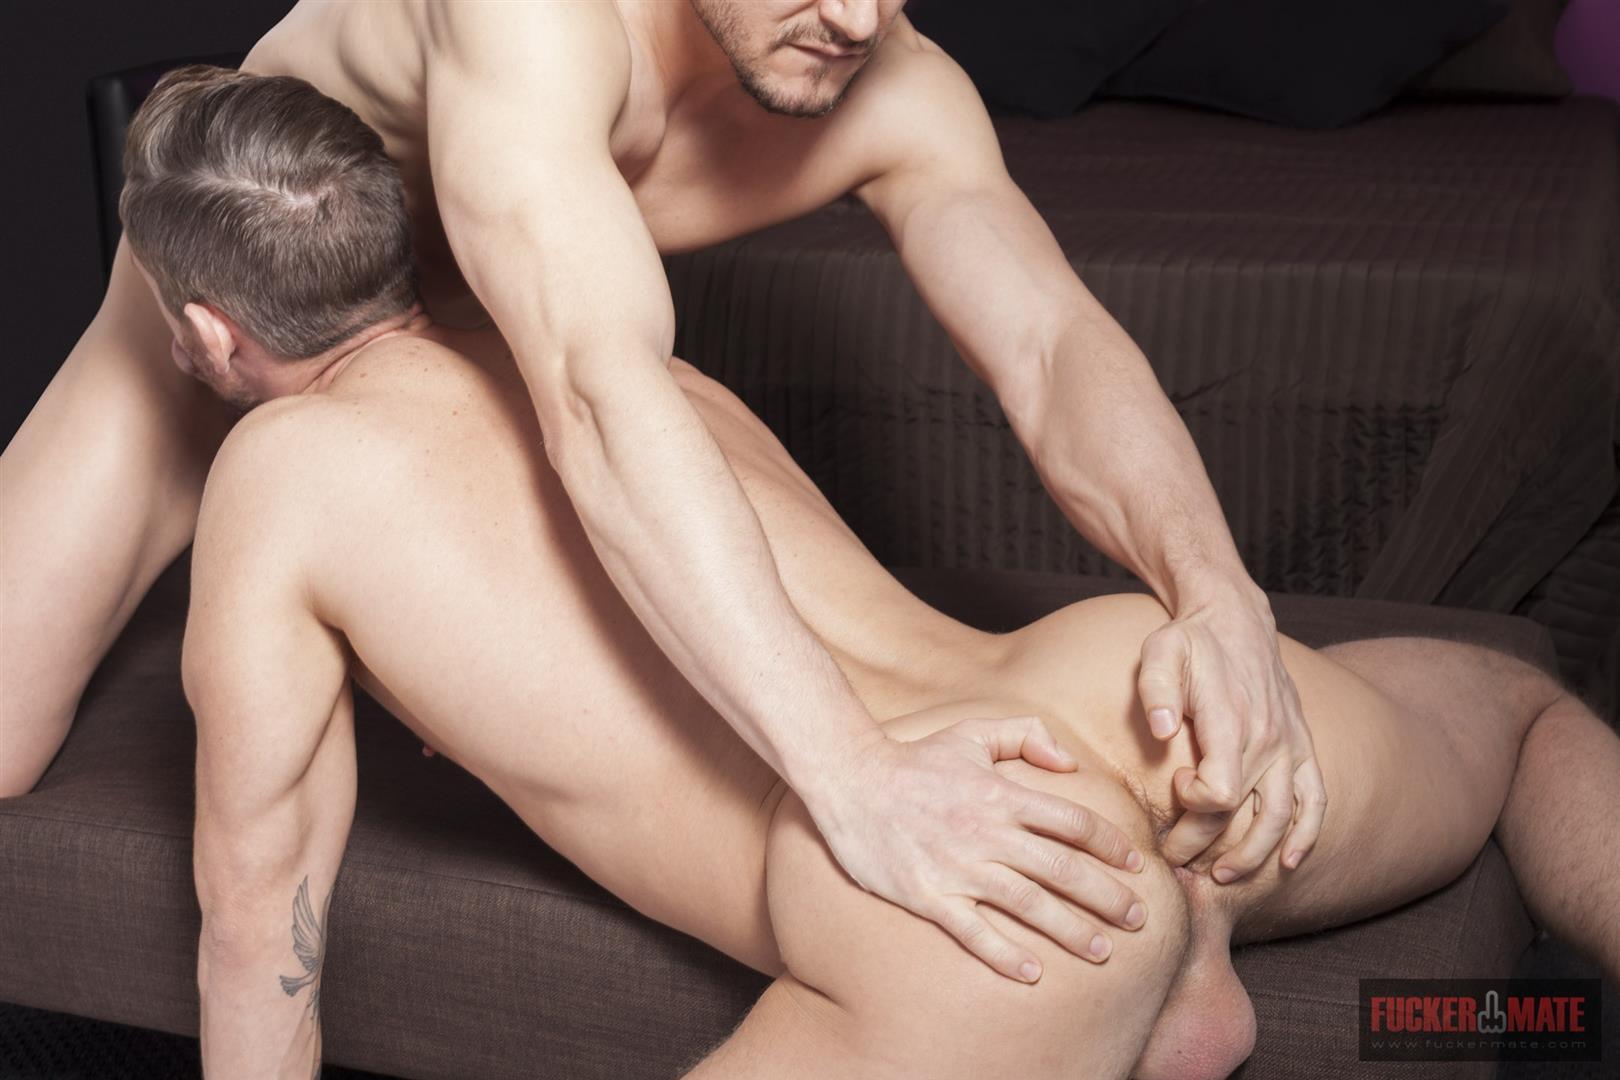 Fuckermate-Nick-North-and-Gabriel-Vanderloo-Muscle-Hunks-With-Big-Uncut-Cocks-Amateur-Gay-Porn-05 European Muscle Hunks Flip Flop Fucking With Their Big Uncut Cocks